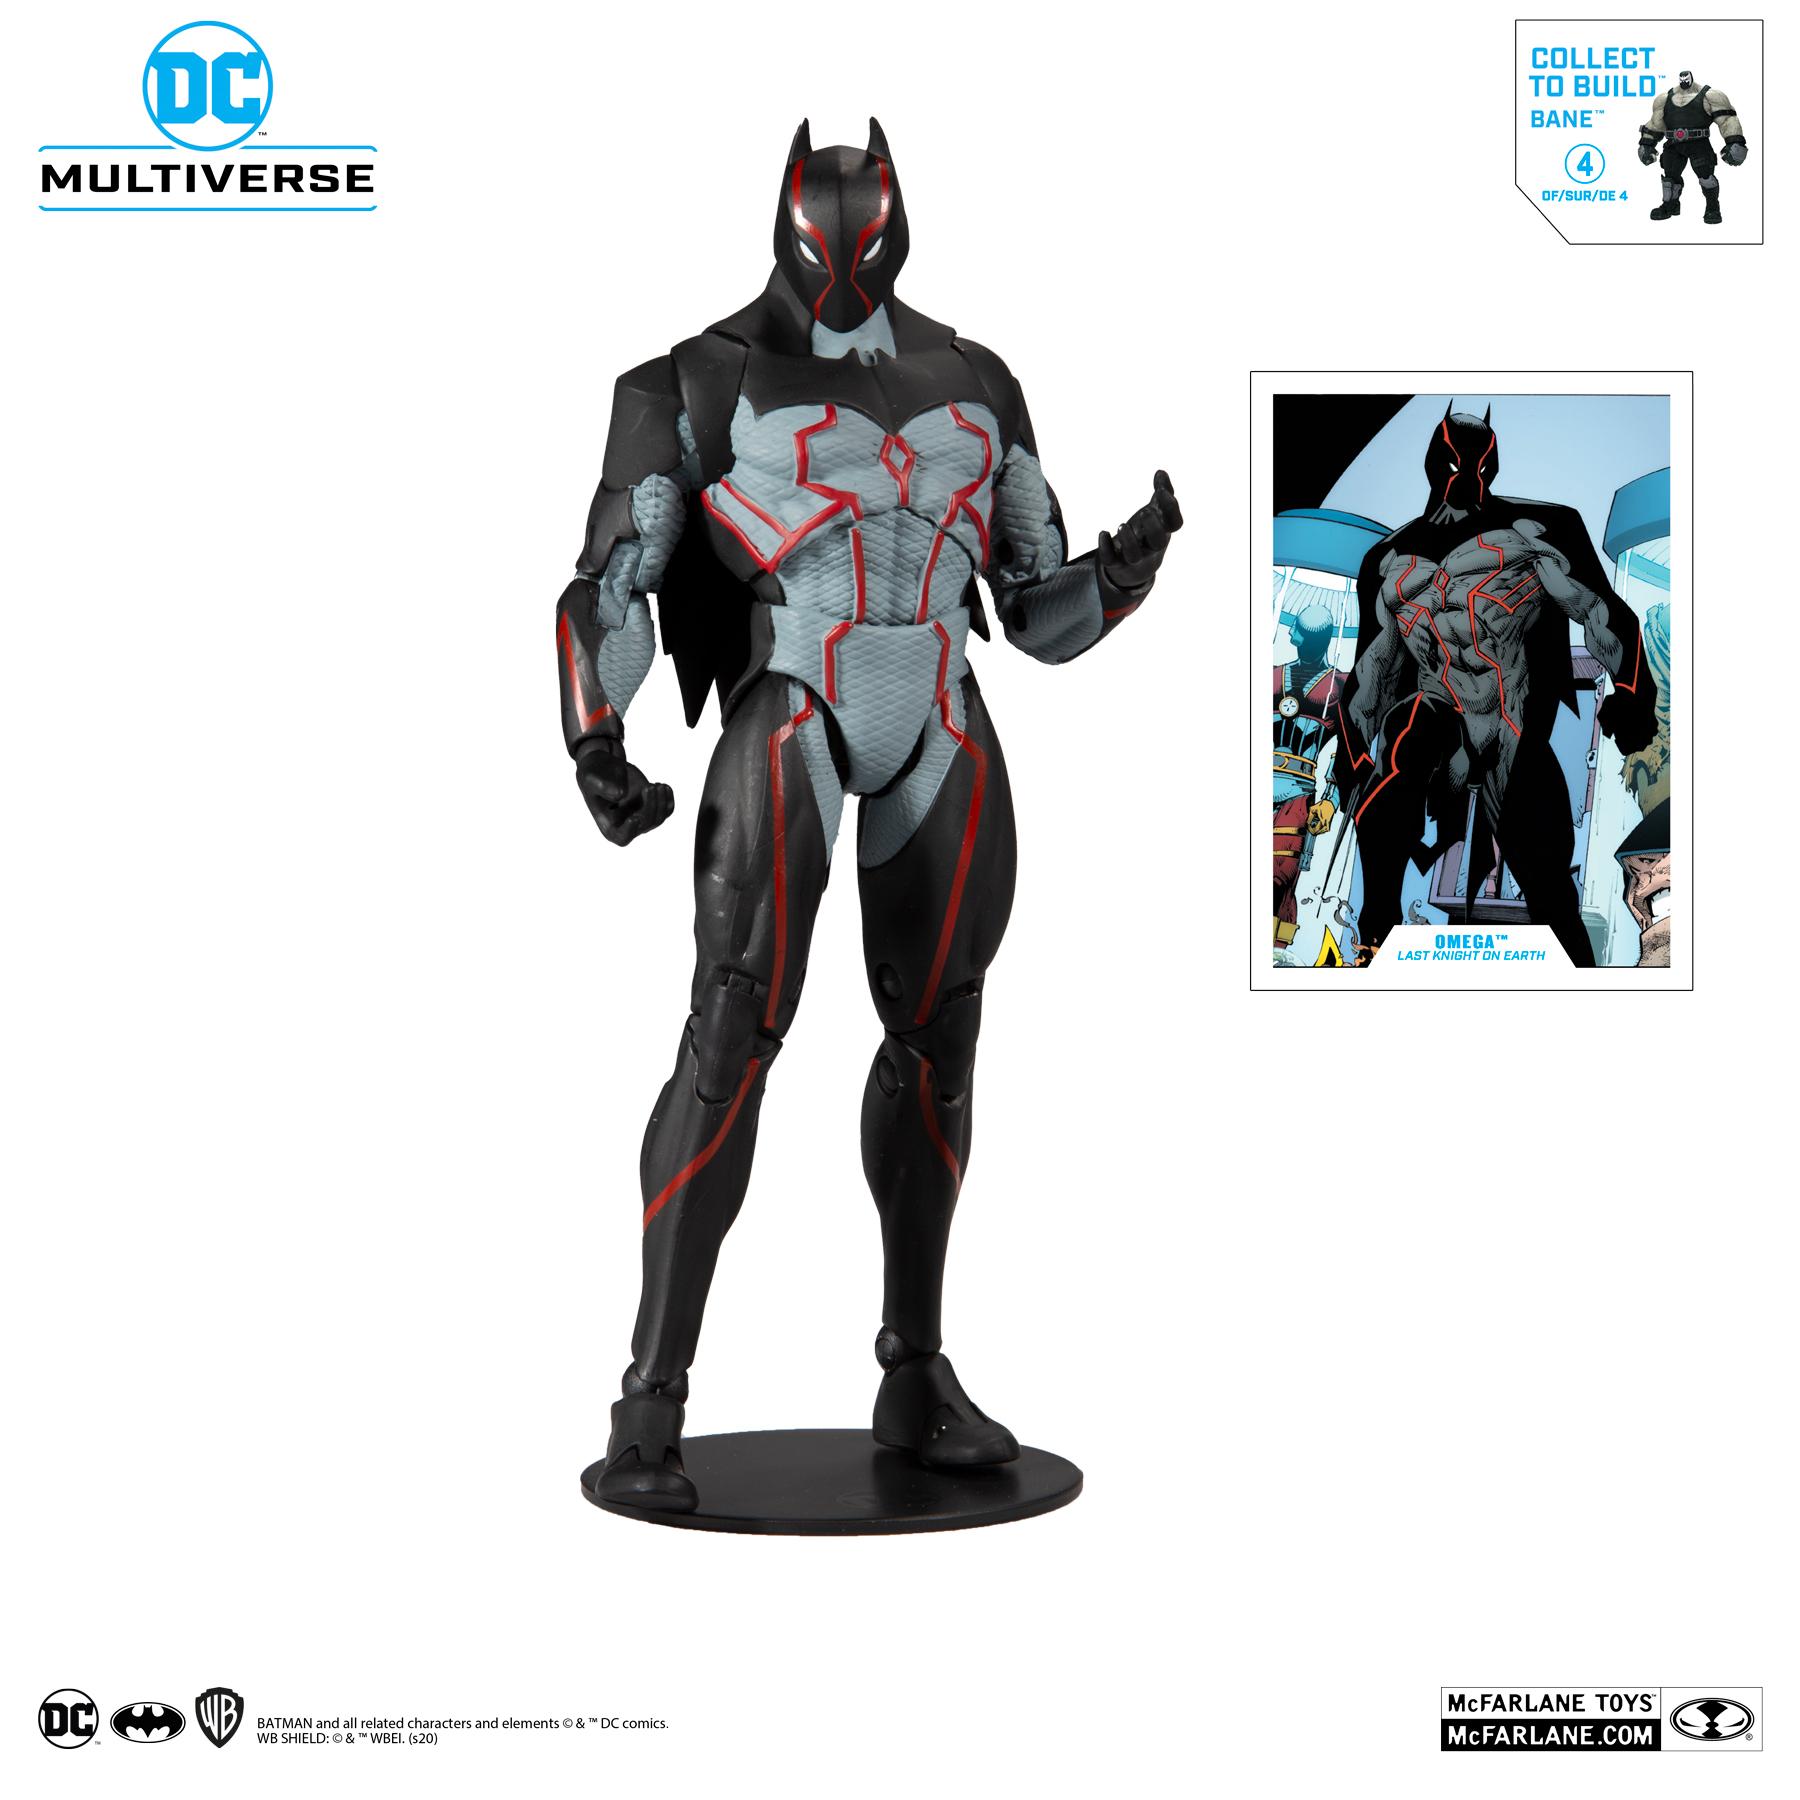 Build-A-Bane) Omega Last Knight on Earth #3